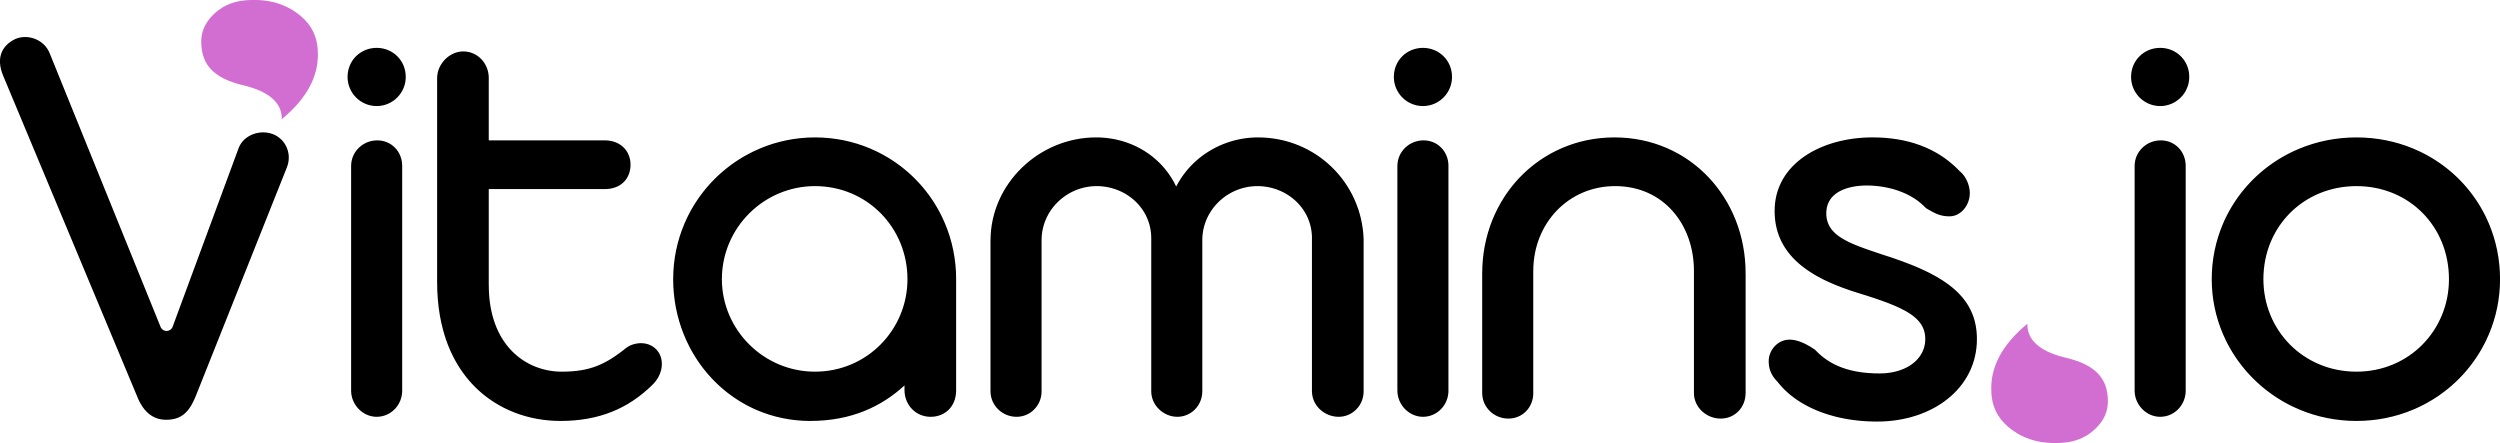 vitamins.io logo with black and purple colors